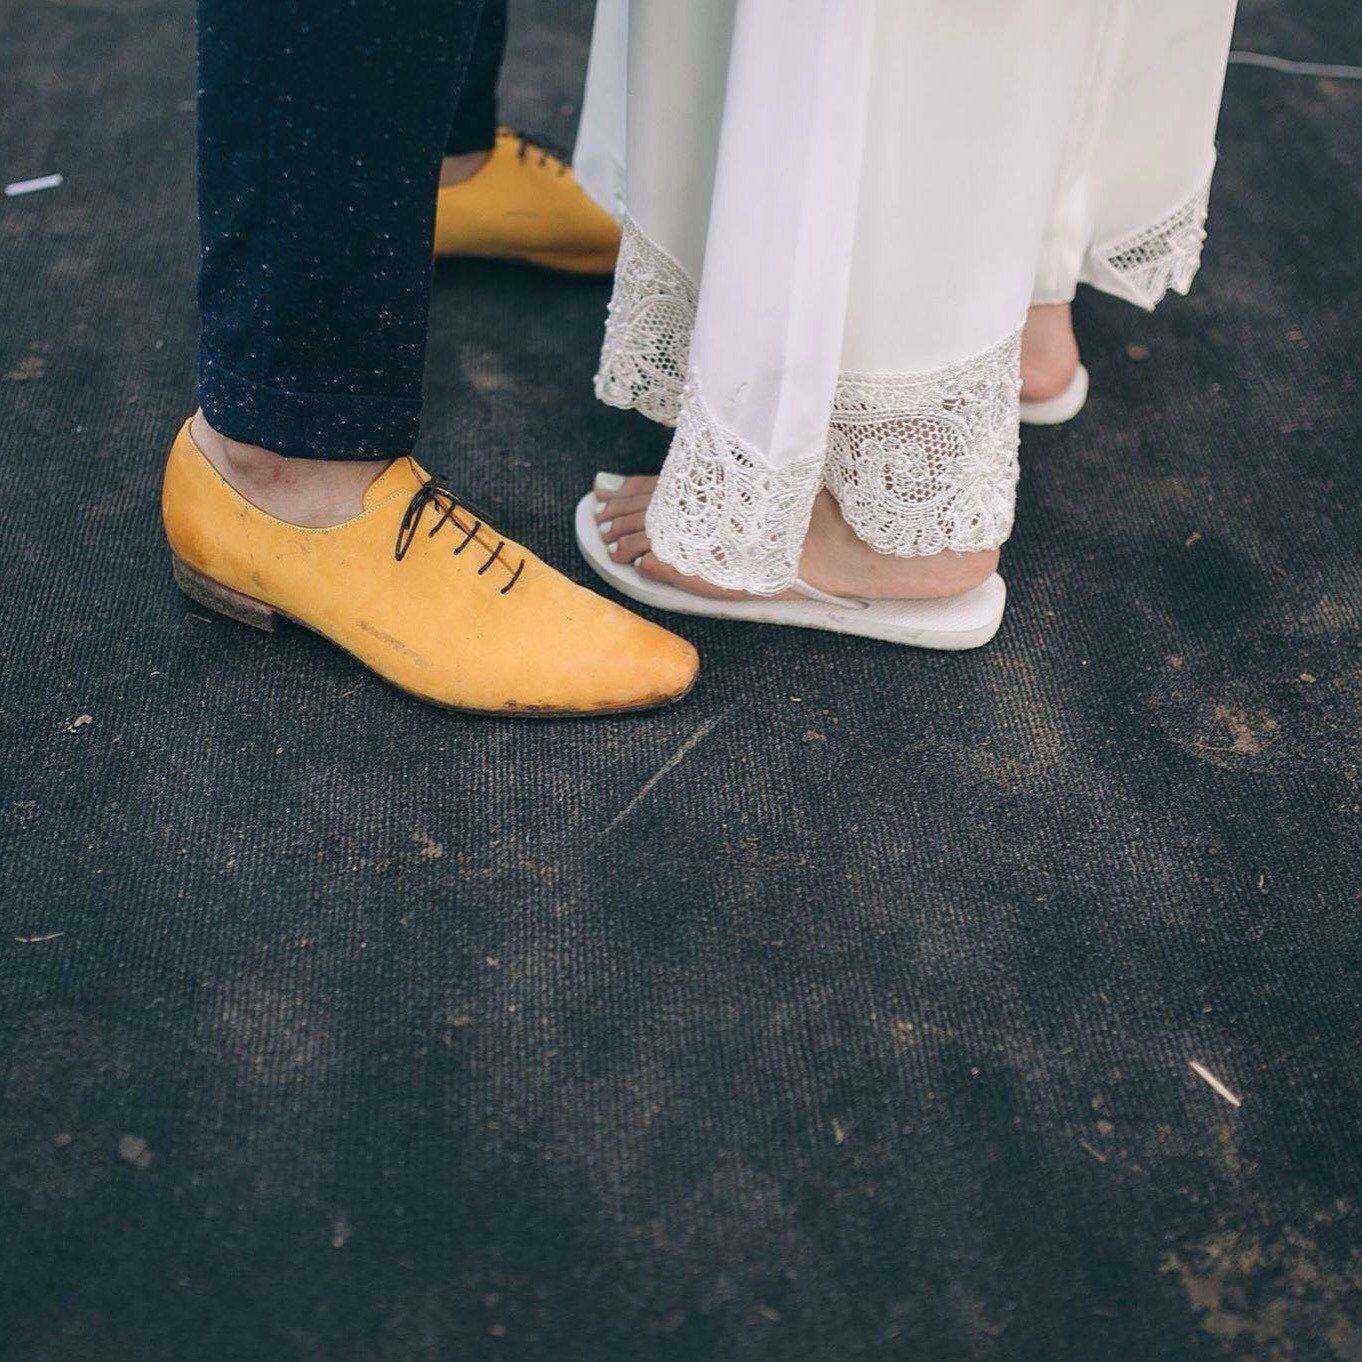 Menus yellow oxford shoes flat shoes menus leather shoes menus